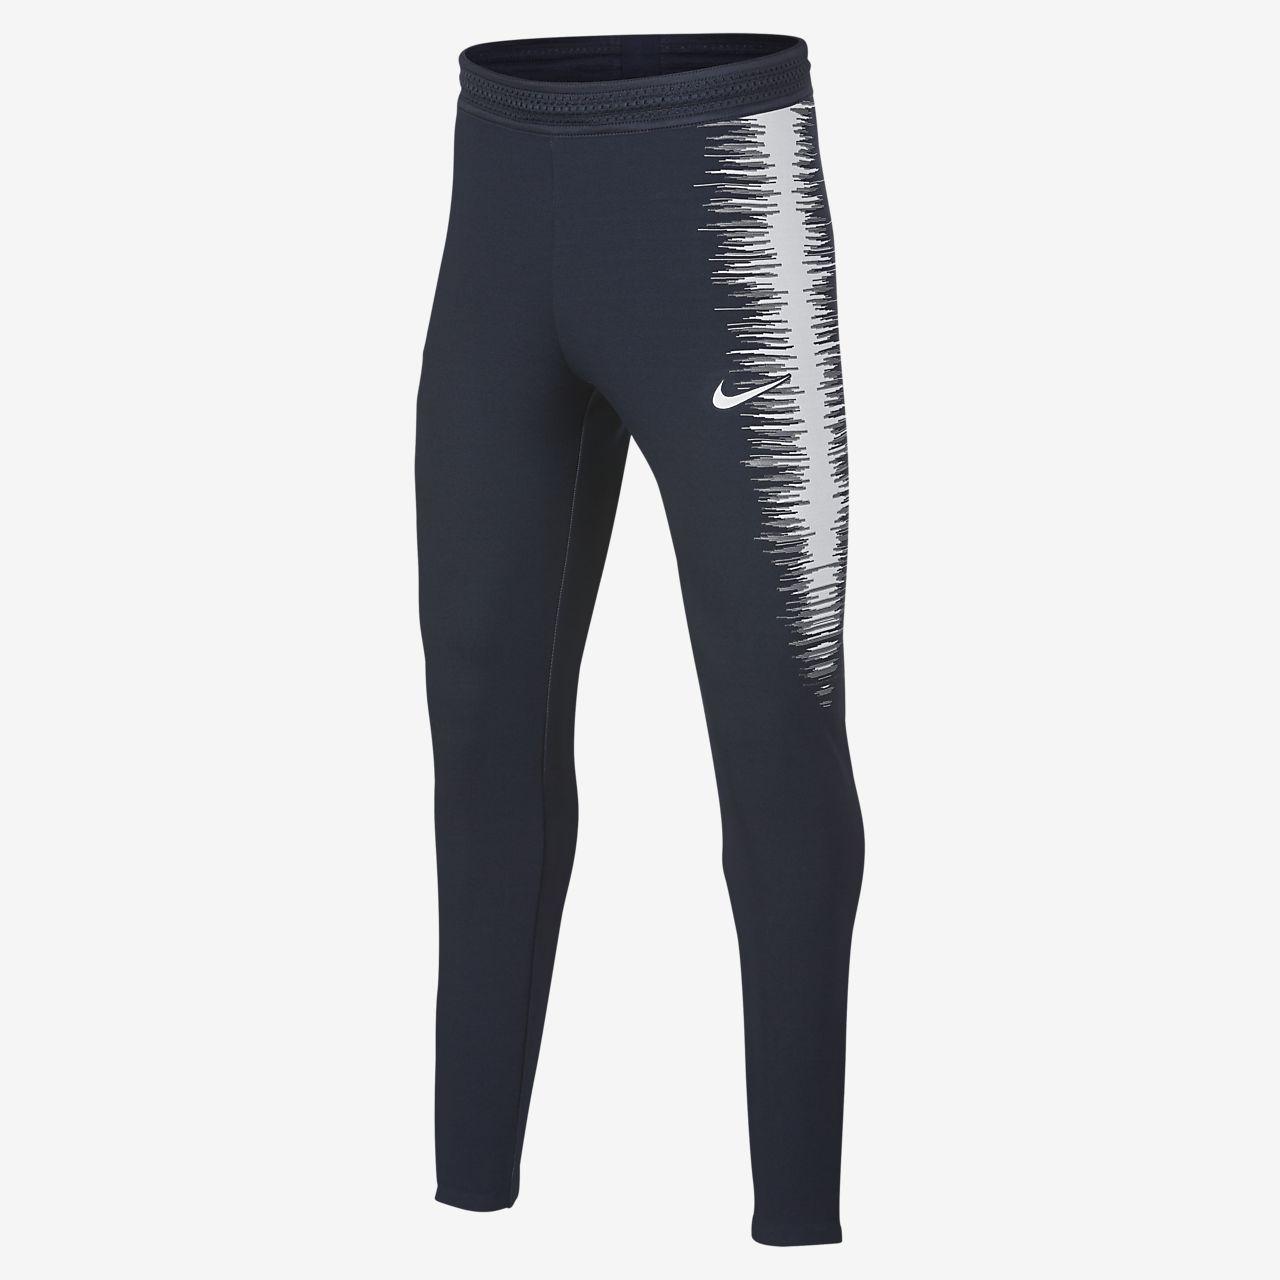 33a474a3bb732 Pantalones de fútbol para niños talla grande FFF AeroSwift Strike ...